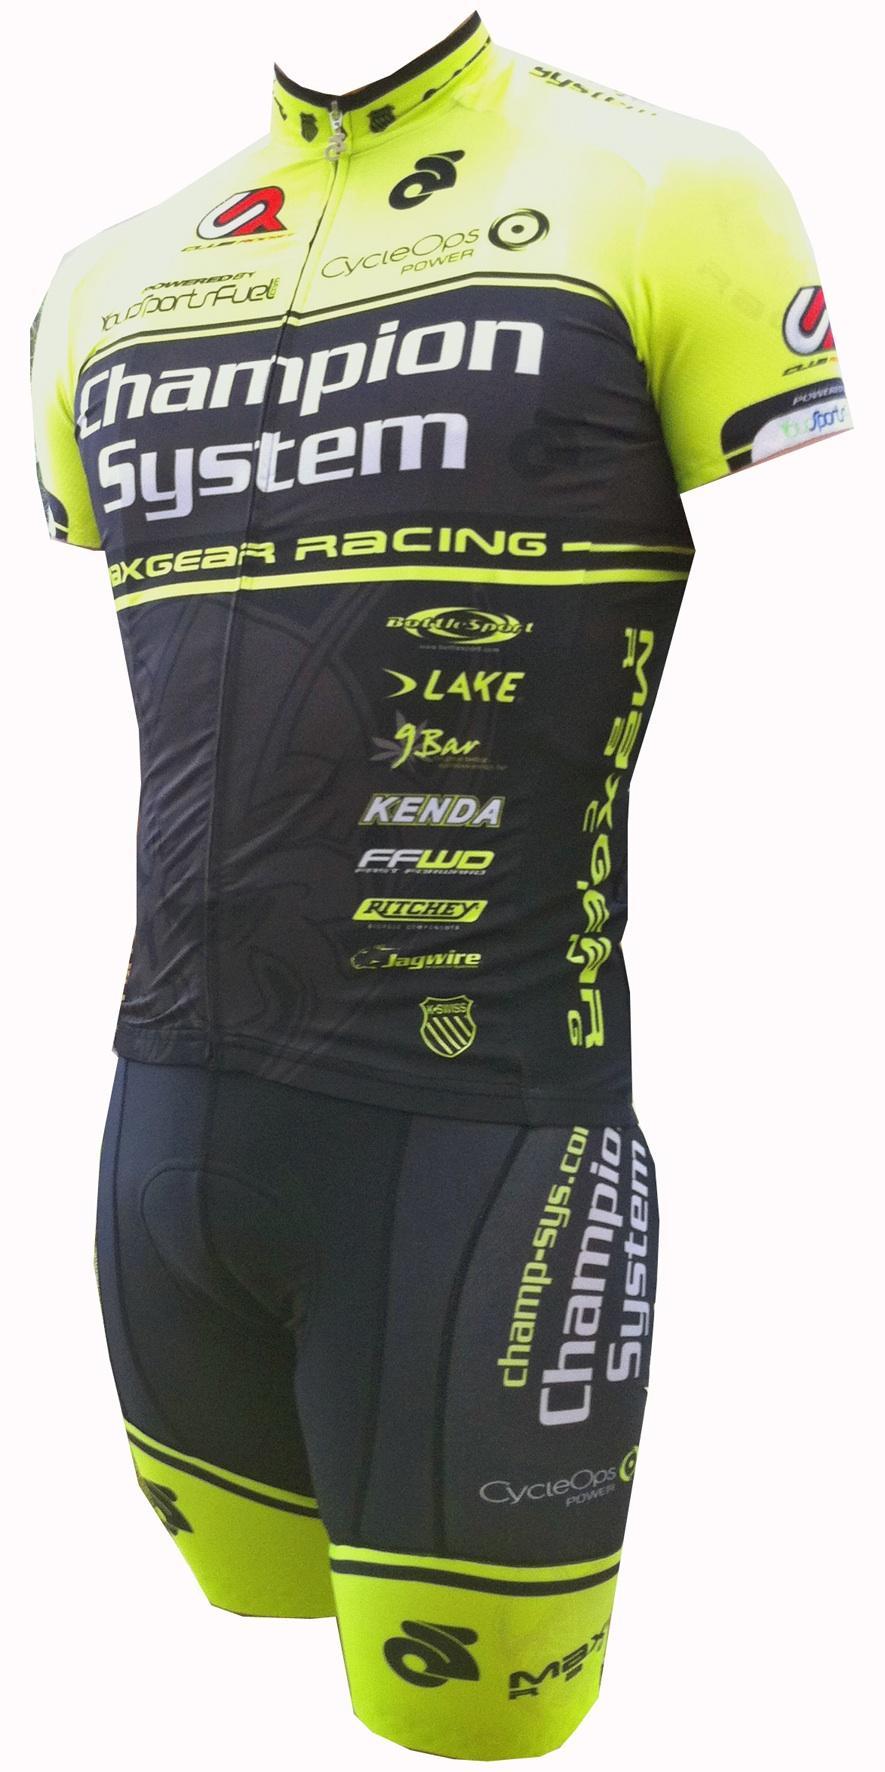 Maxgear 2011 kit.jpg